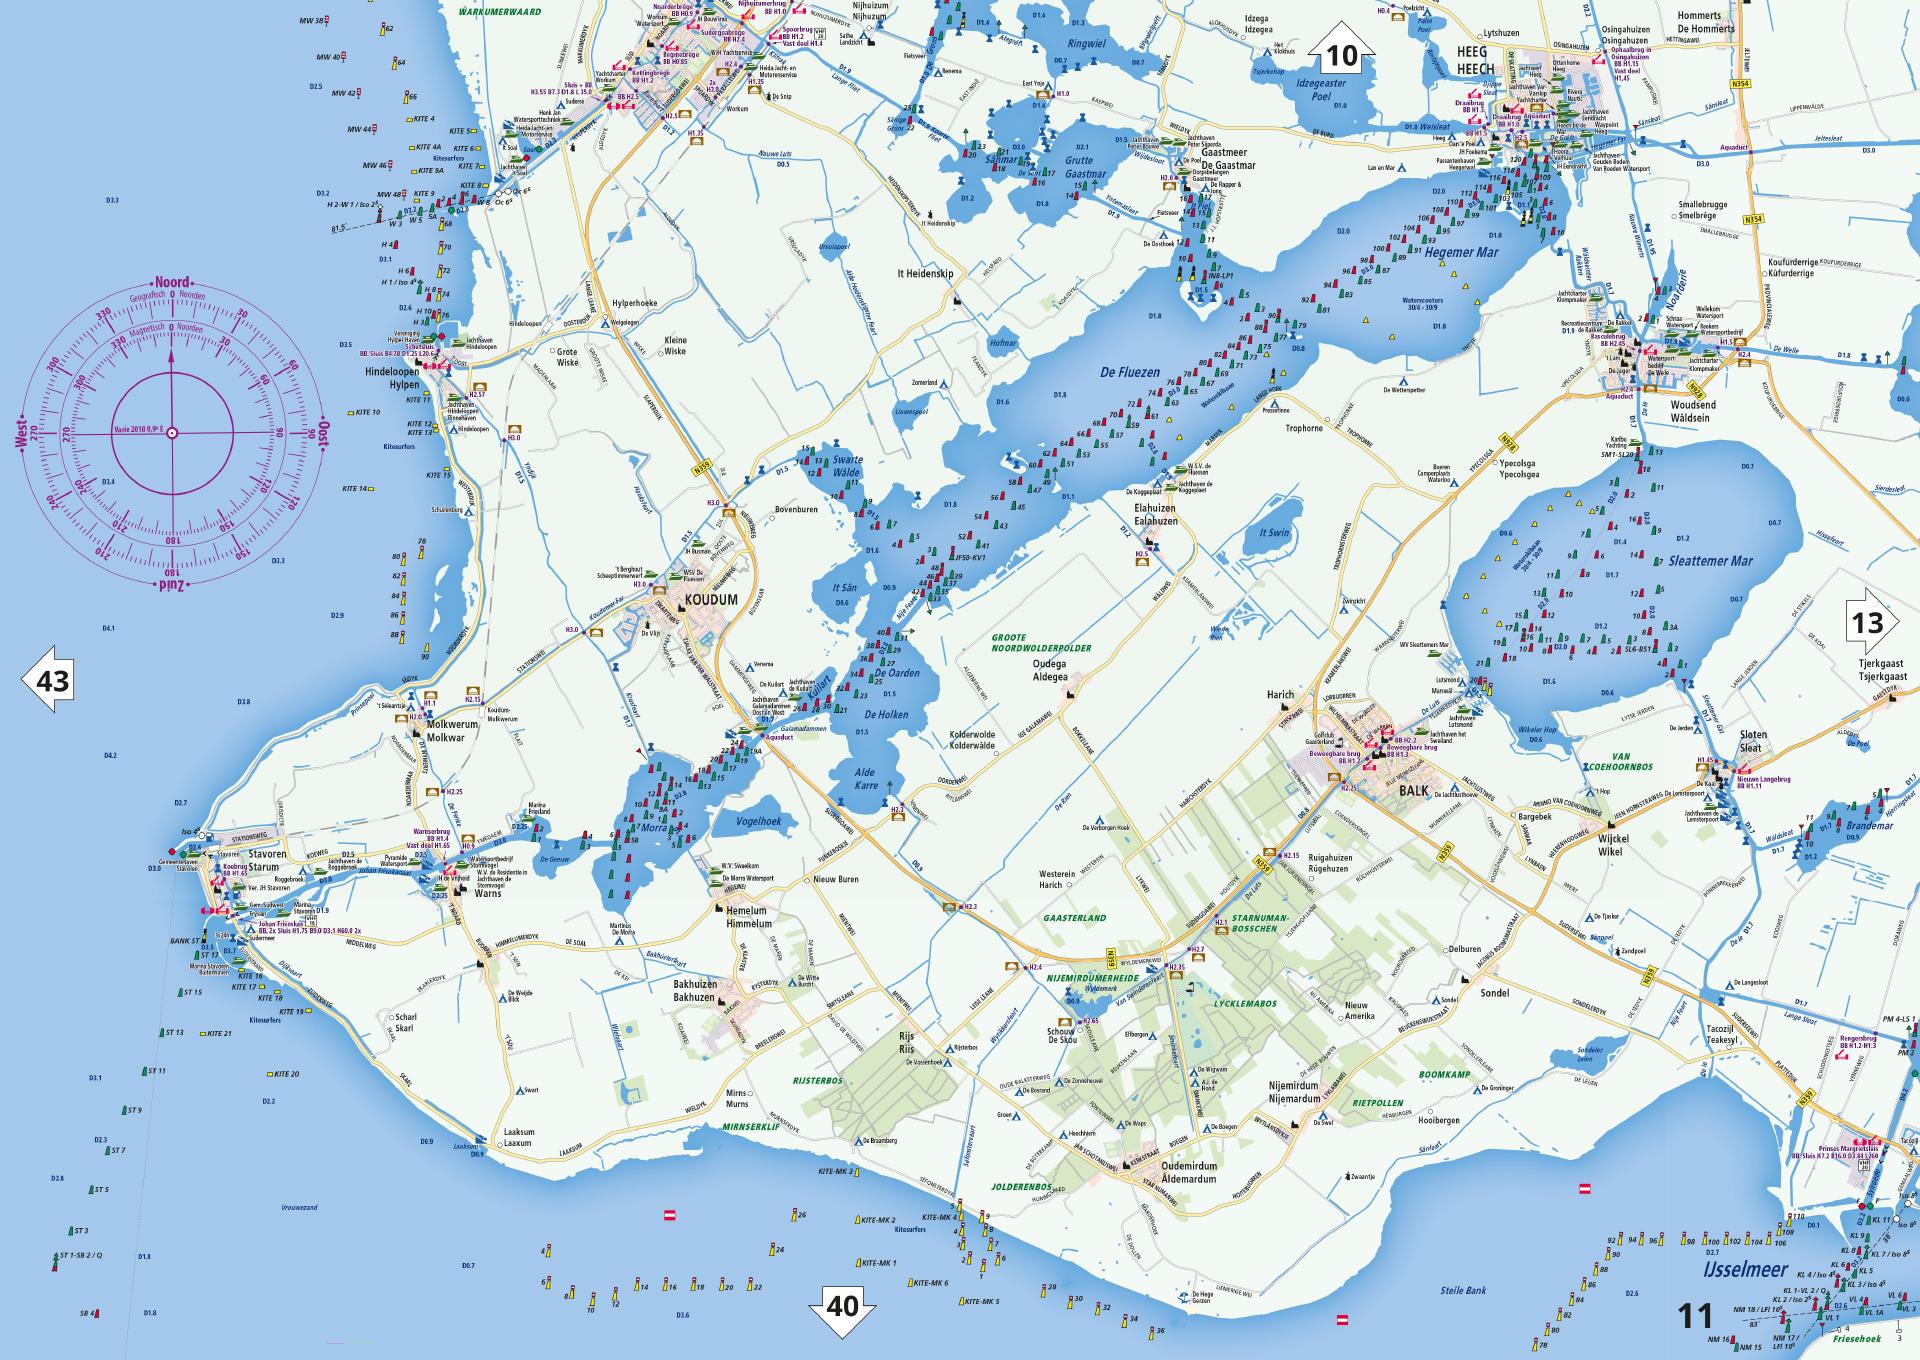 Nieuwe vaarkaart waterkaart; waterkaart Friesland incl. mobiele vaar app